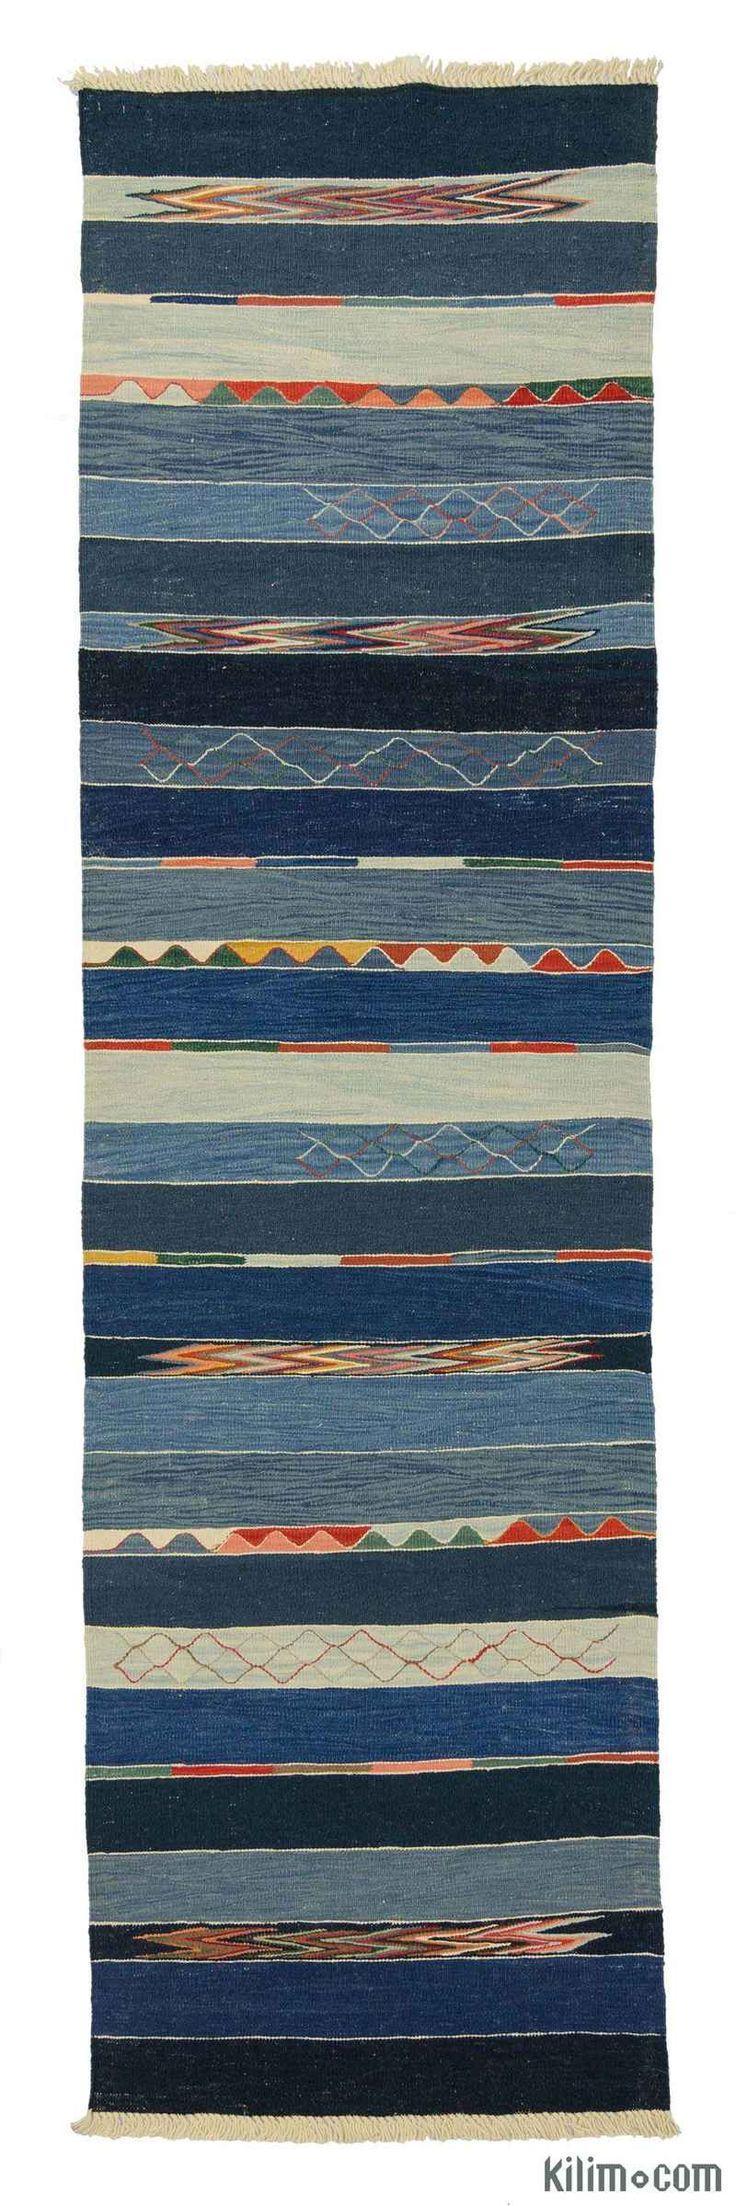 K0007971 Blue, Light Blue New Turkish Kilim Rug - LUWIA   Kilim Rugs, Overdyed Vintage Rugs, Hand-made Turkish Rugs, Patchwork Carpets by Kilim.com